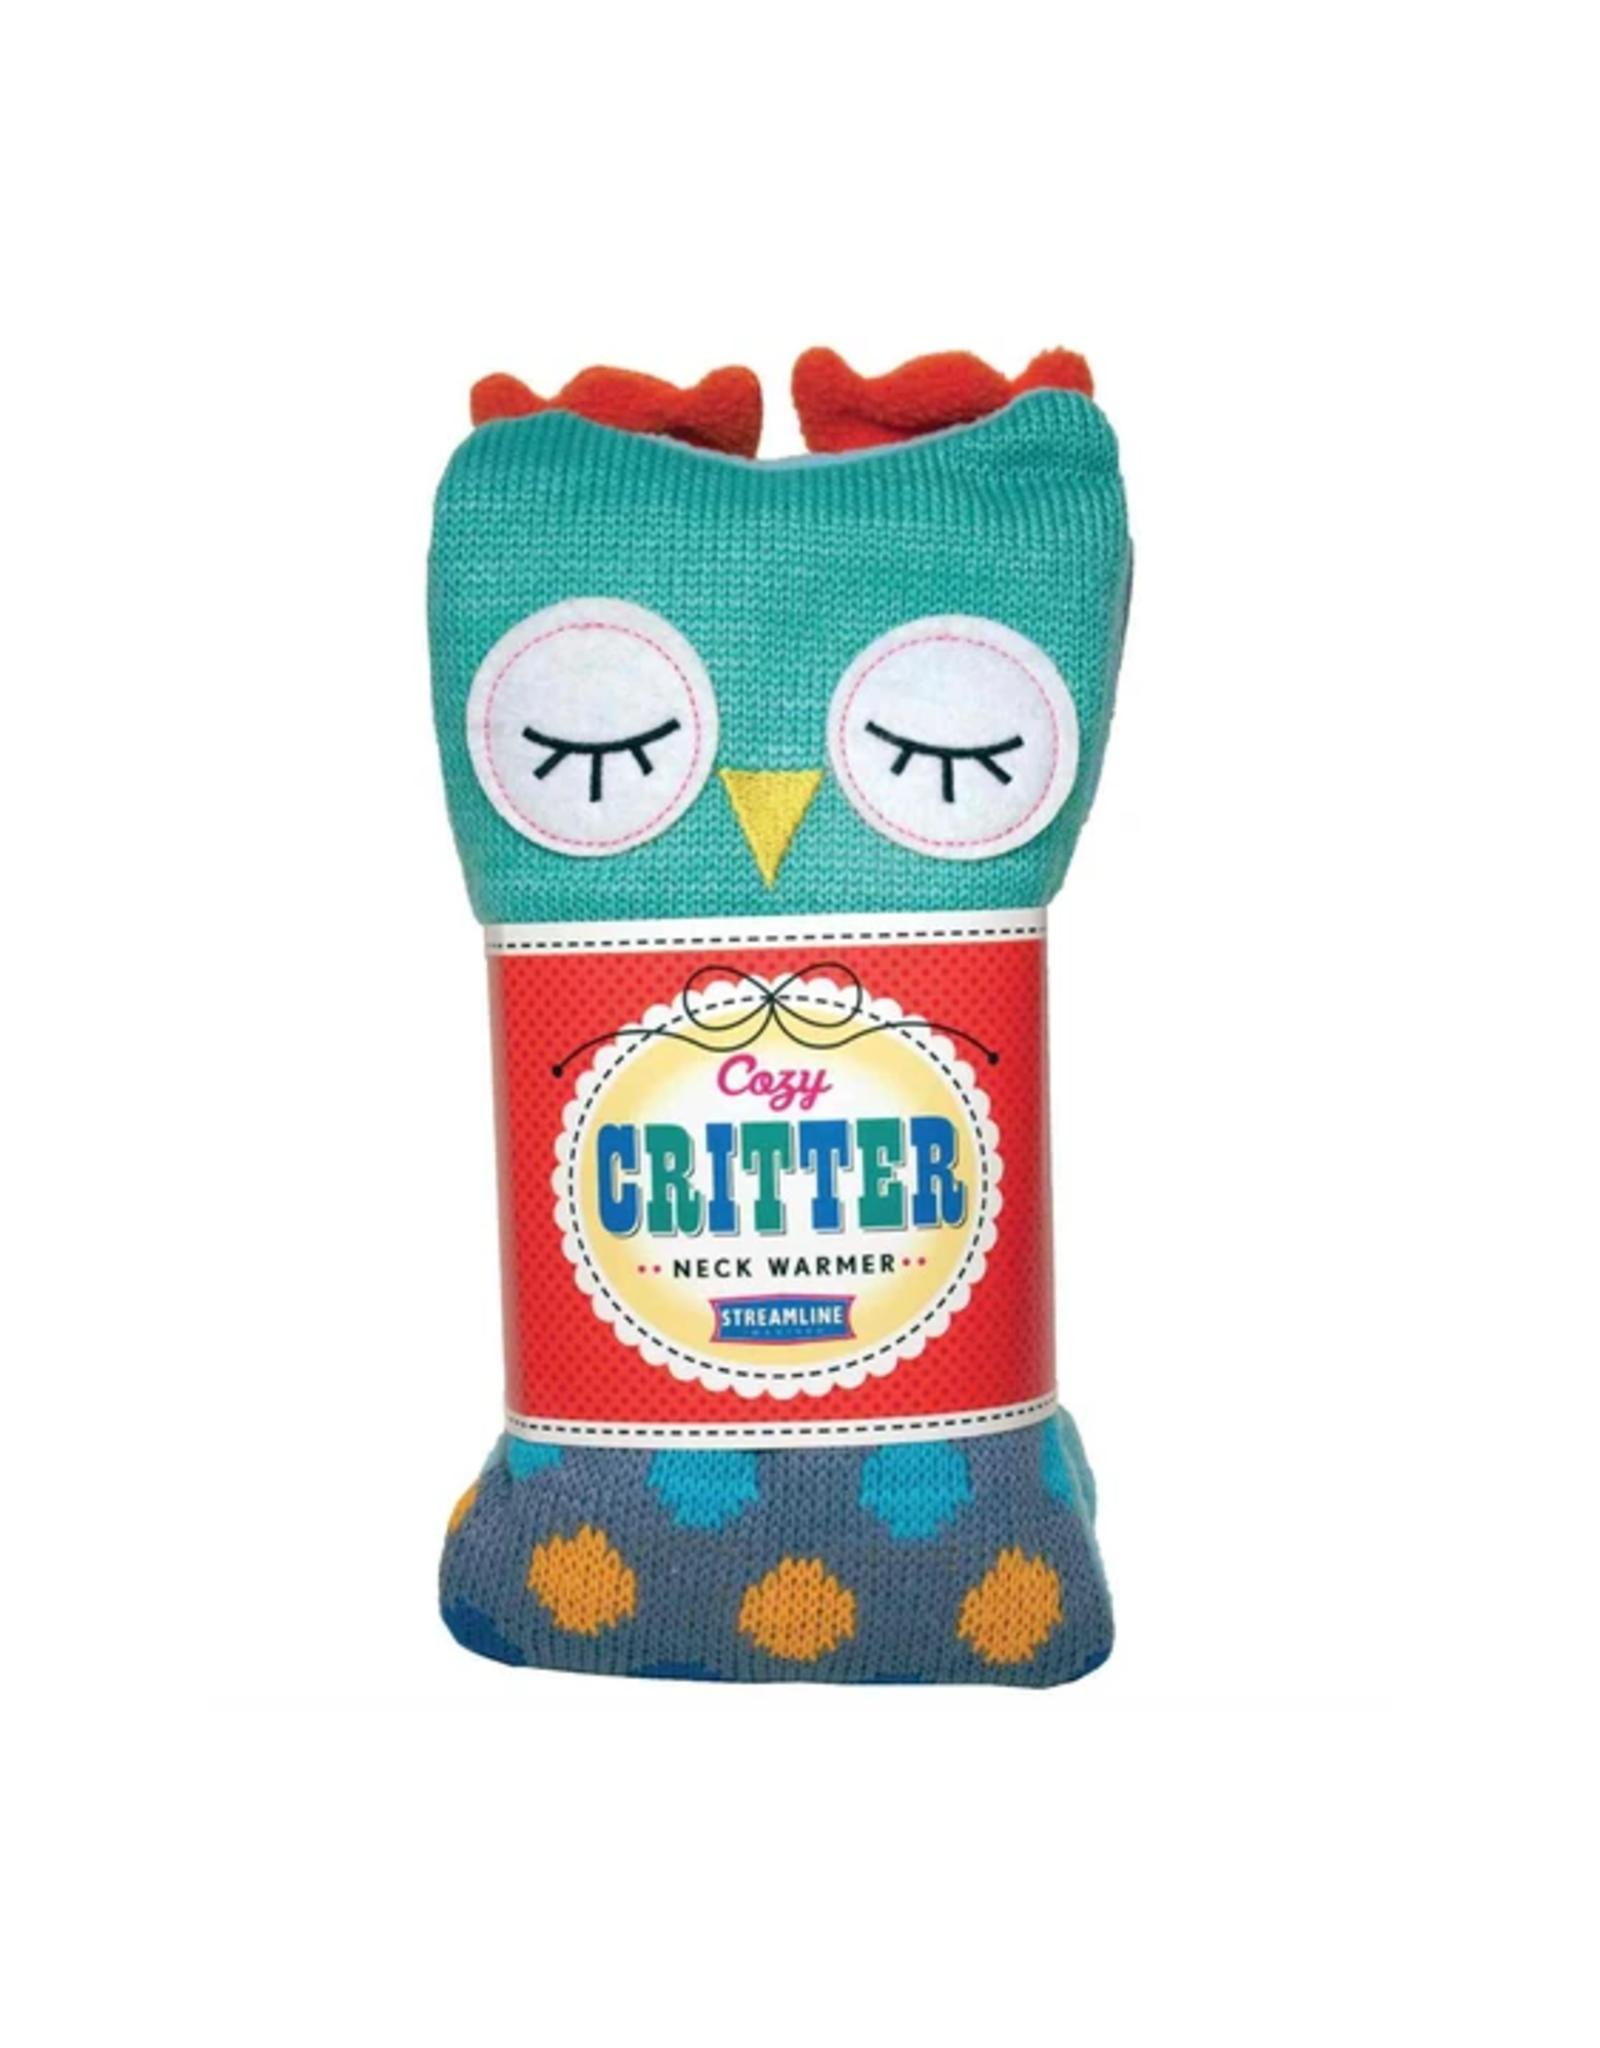 Owl Cozy Critter Herbal Neck Warmer